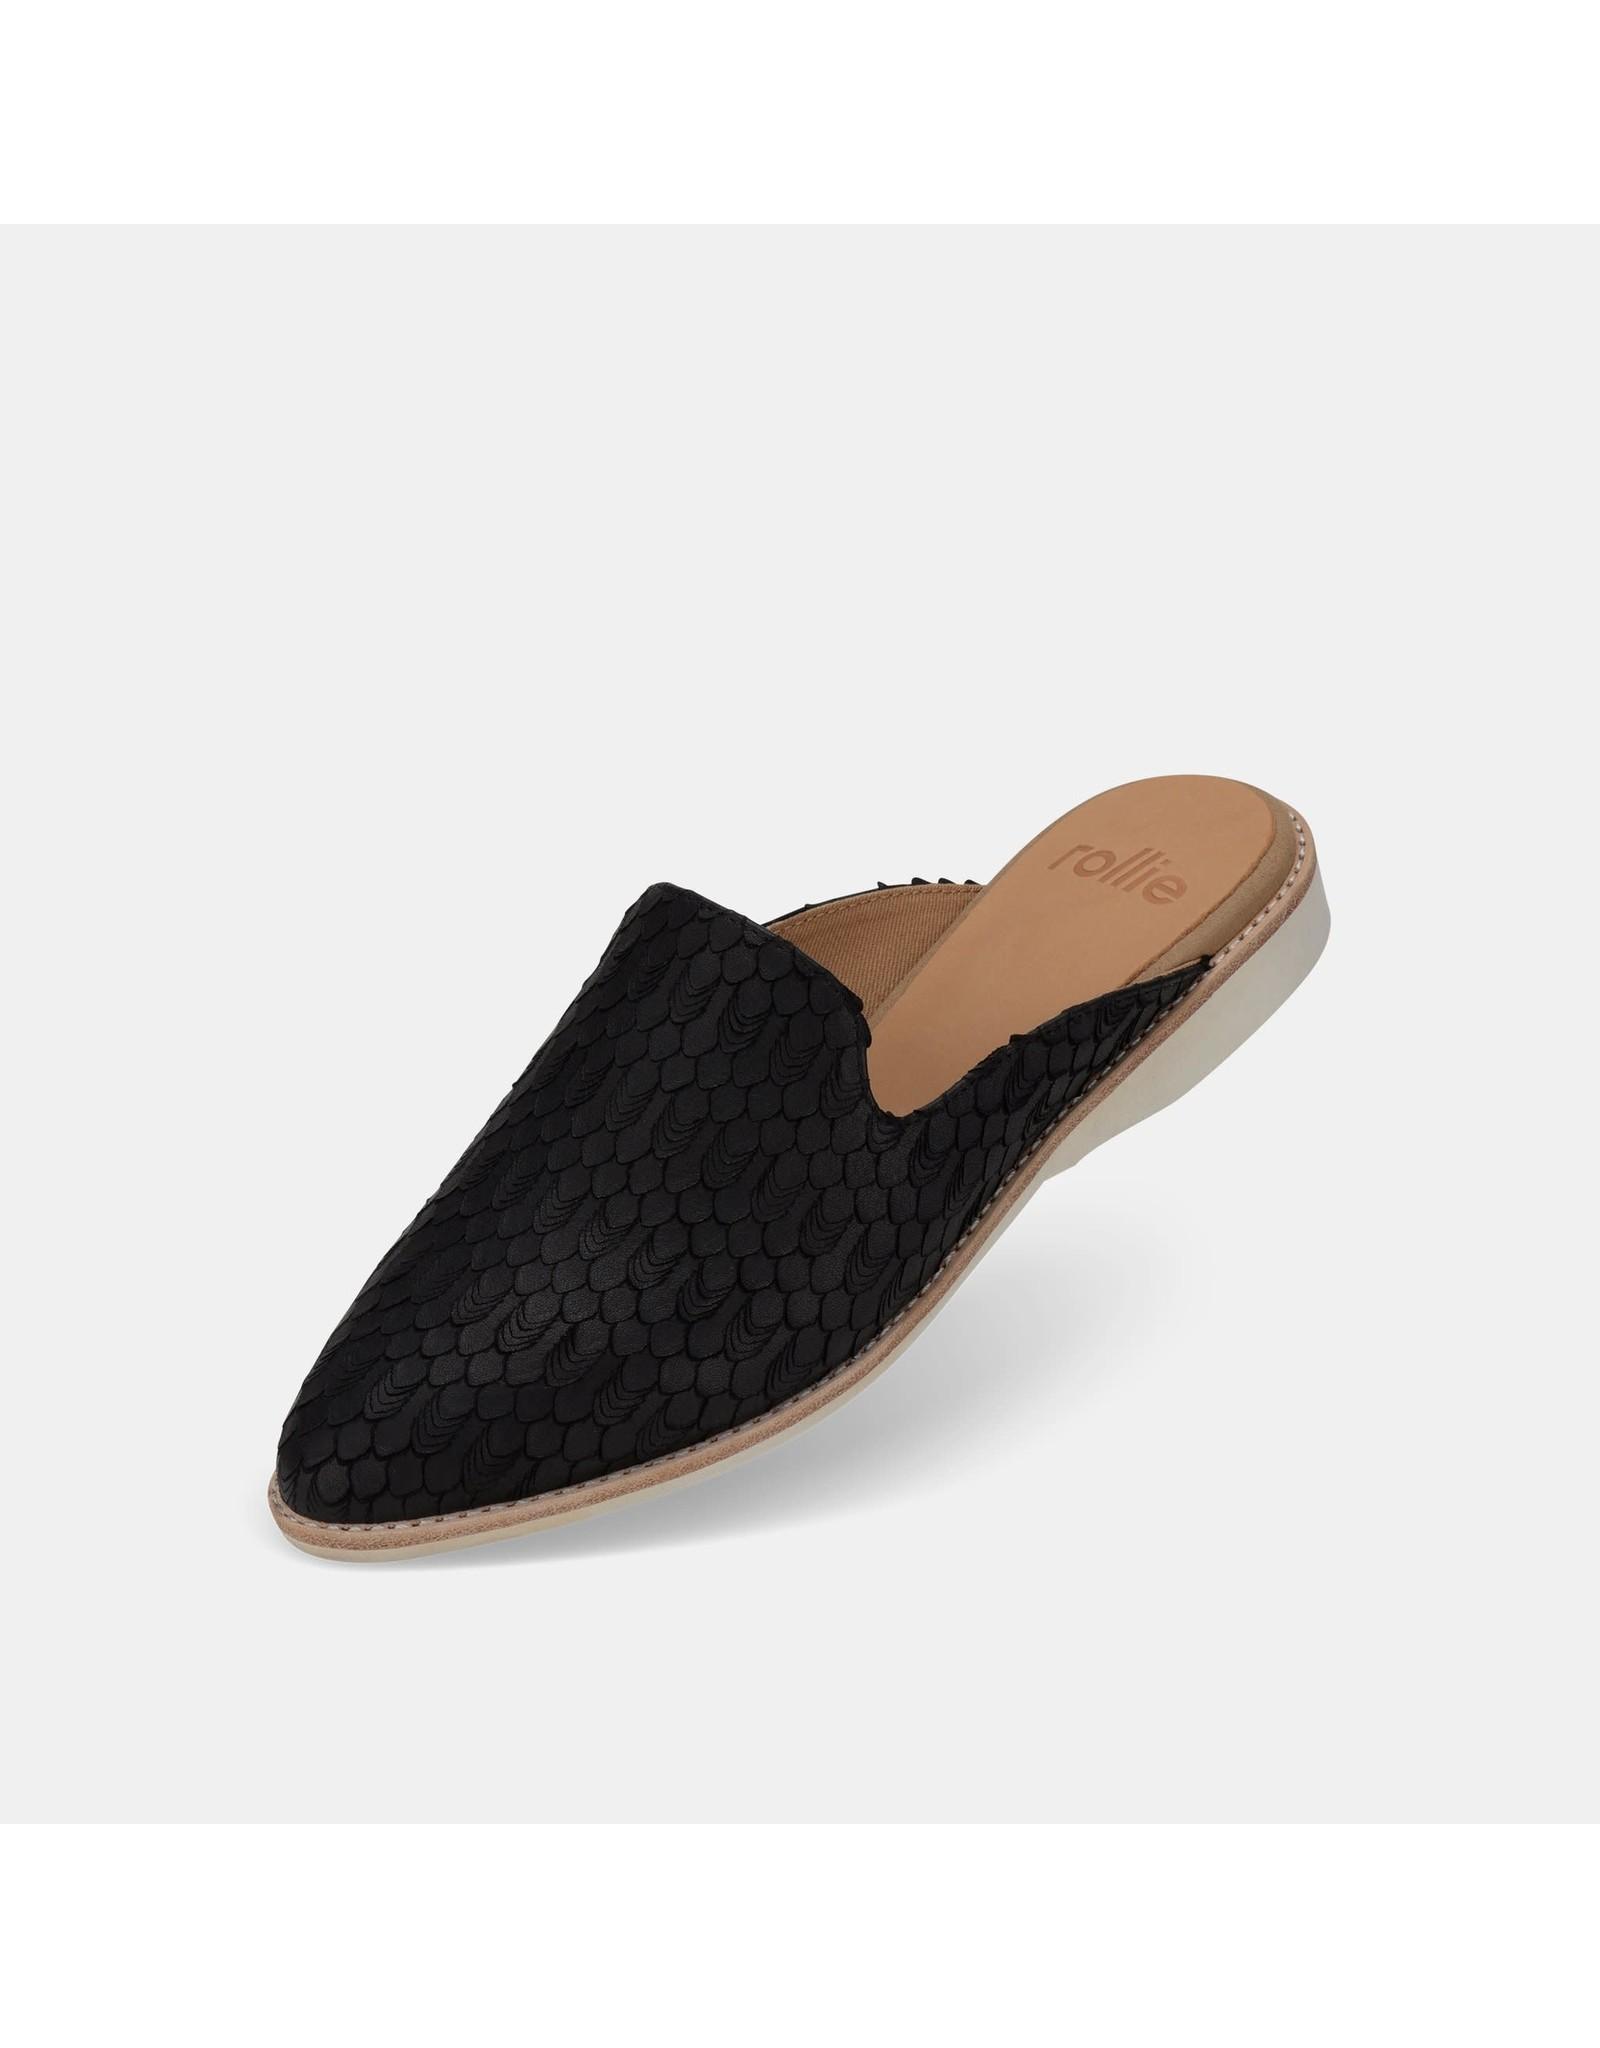 Rollie Shoes Rollie - Madison Mule (black geo)